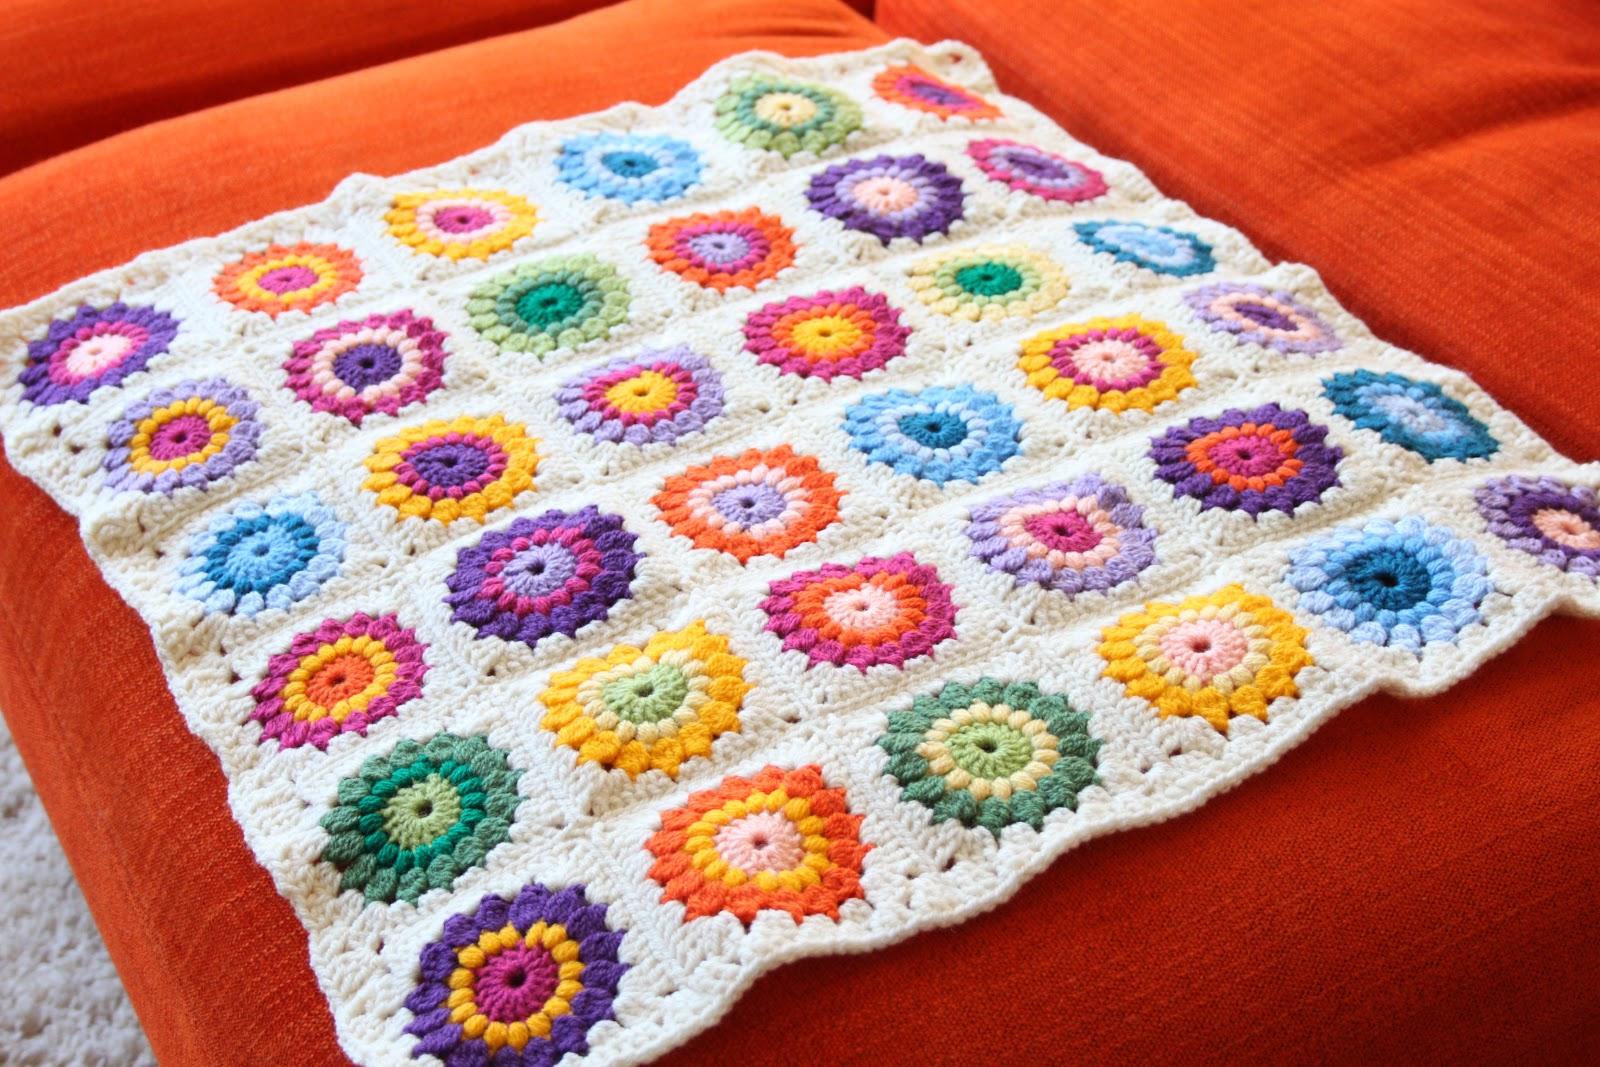 Nittybits Sunburst Granny Square Blanket Tutorial